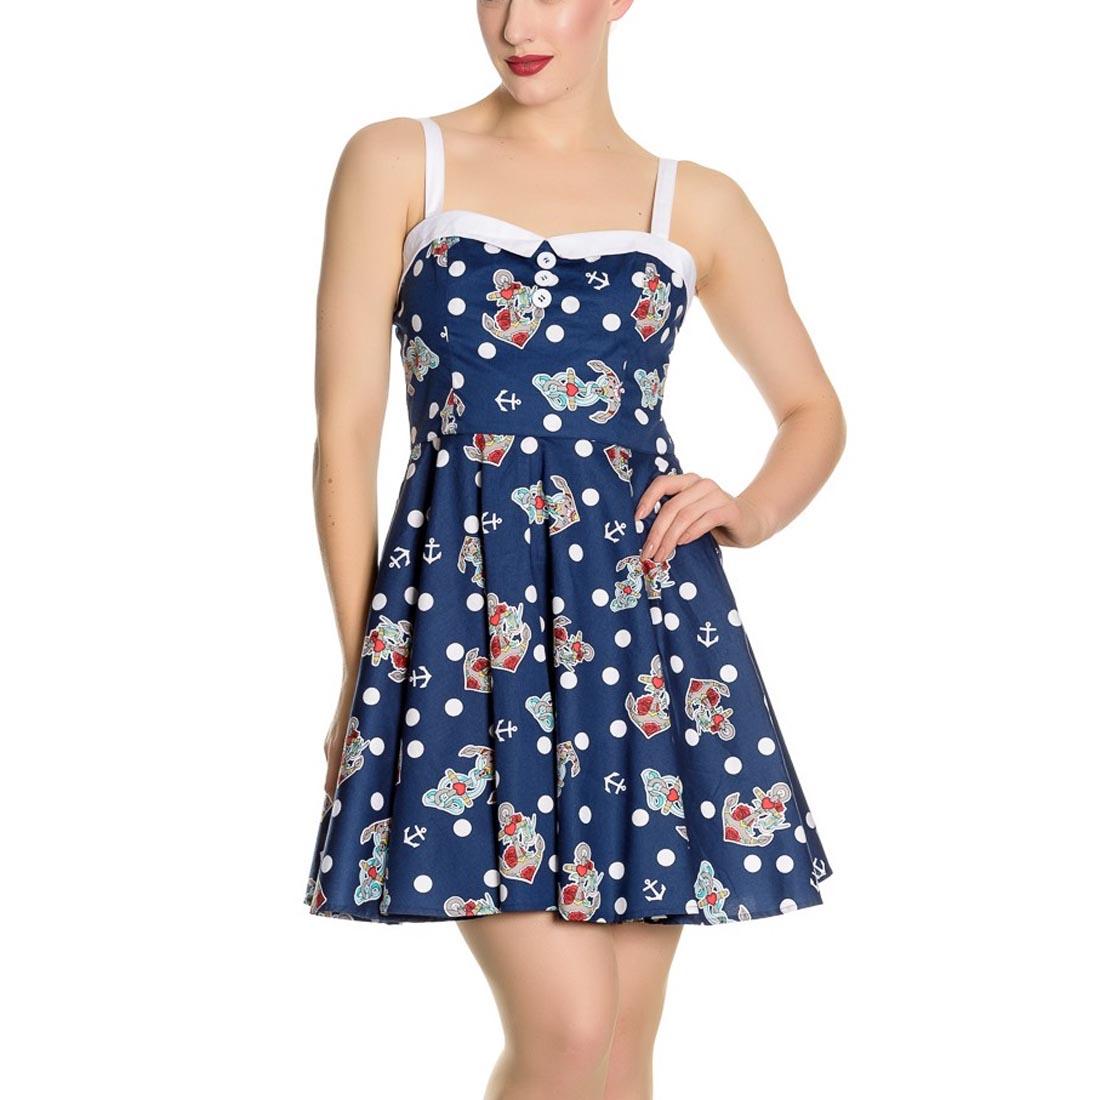 Hell-Bunny-Navy-Blue-50s-Nautical-Mini-Dress-OCEANA-Polka-Dot-All-Sizes thumbnail 23